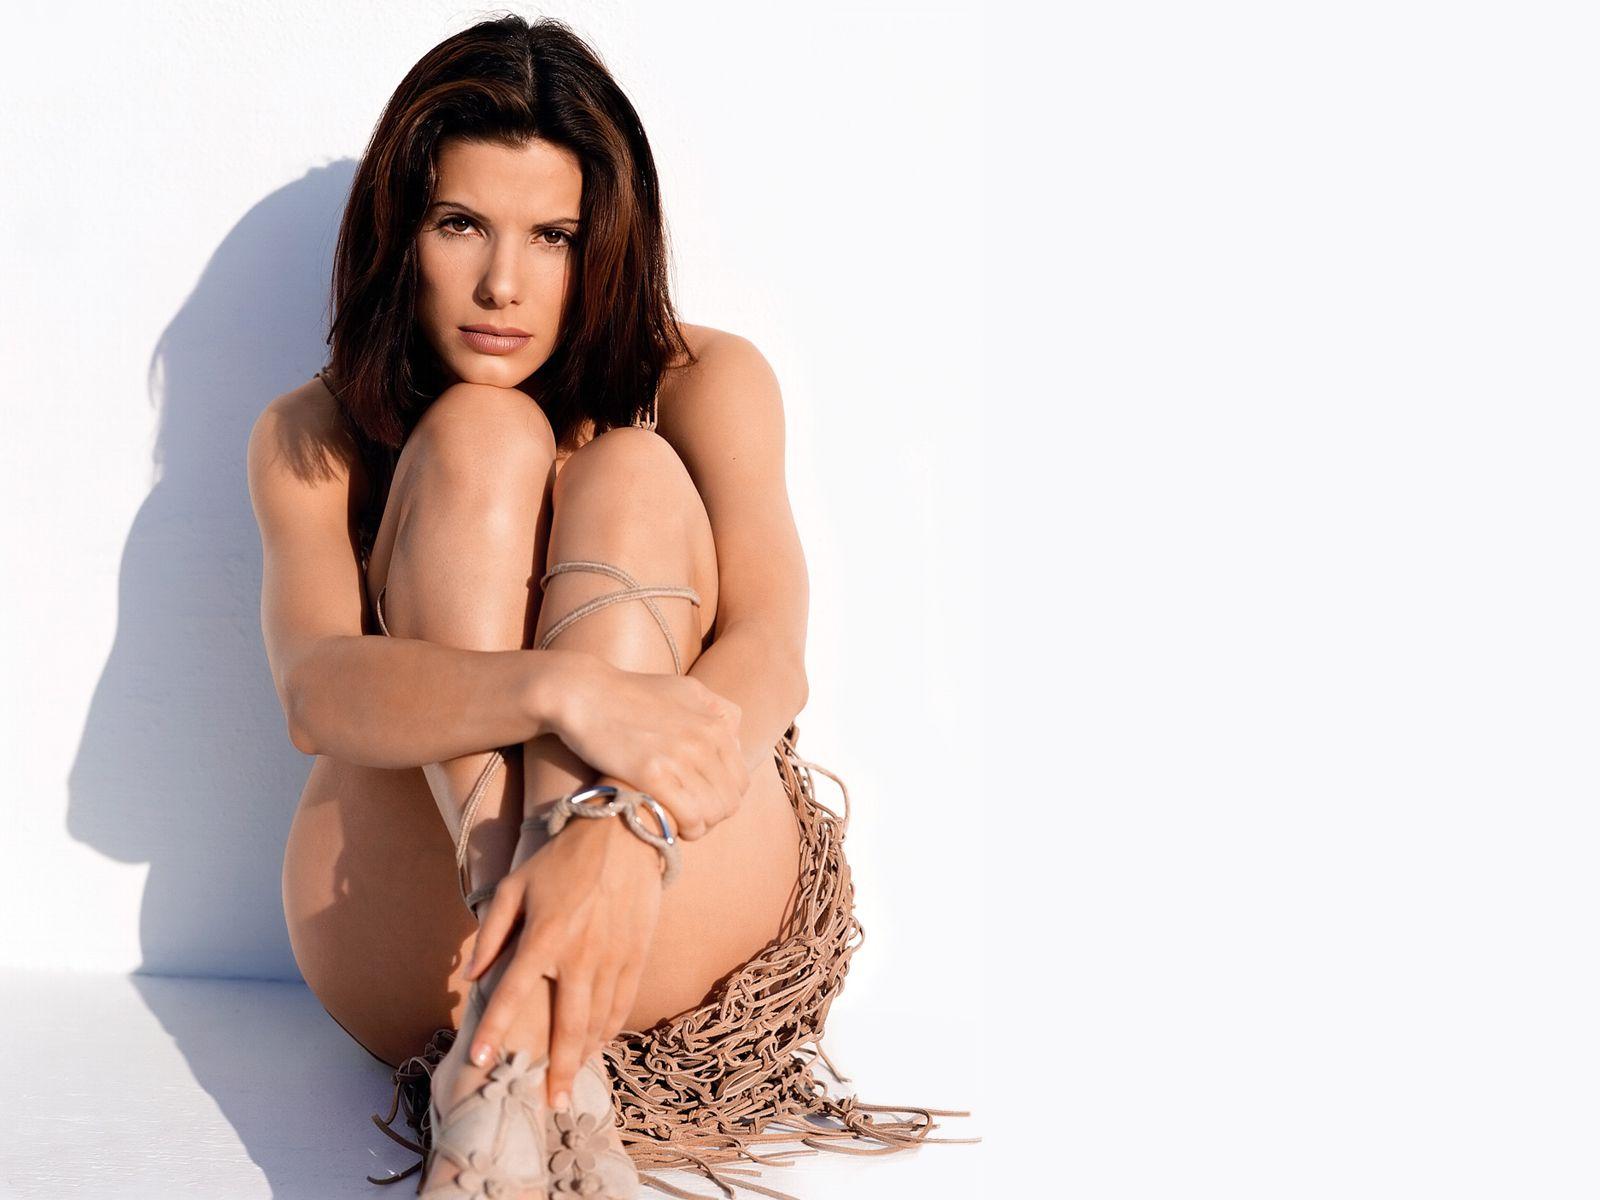 Sandra bullock bikini photos